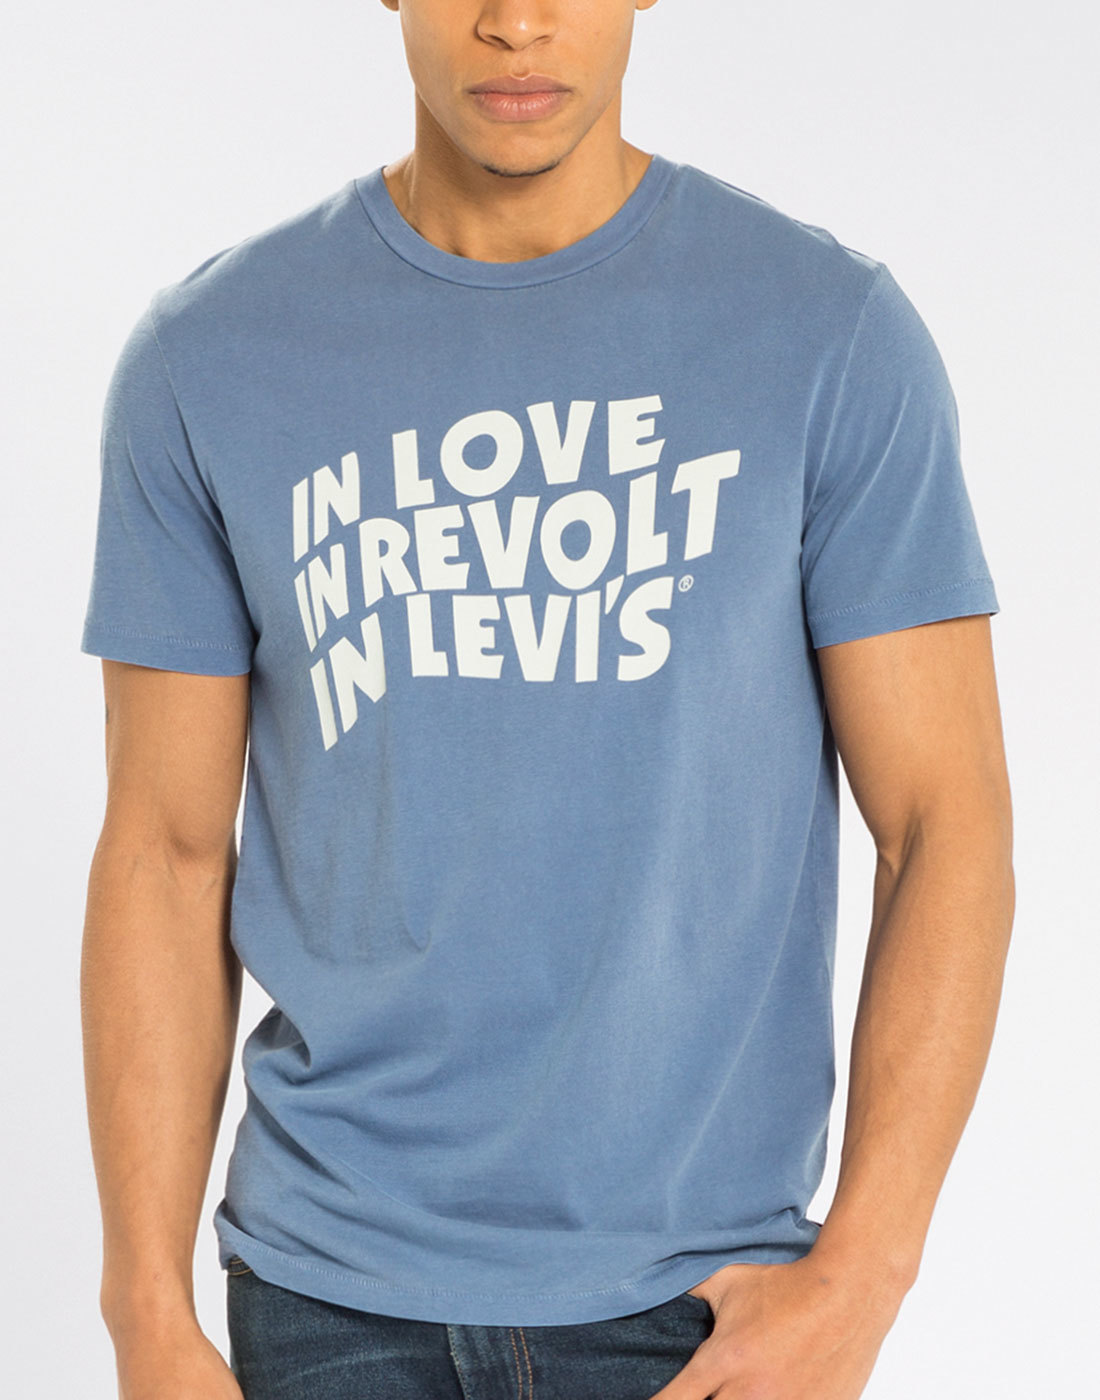 LEVI'S® In Love In Revolt In Levi's Retro Tee BLUE